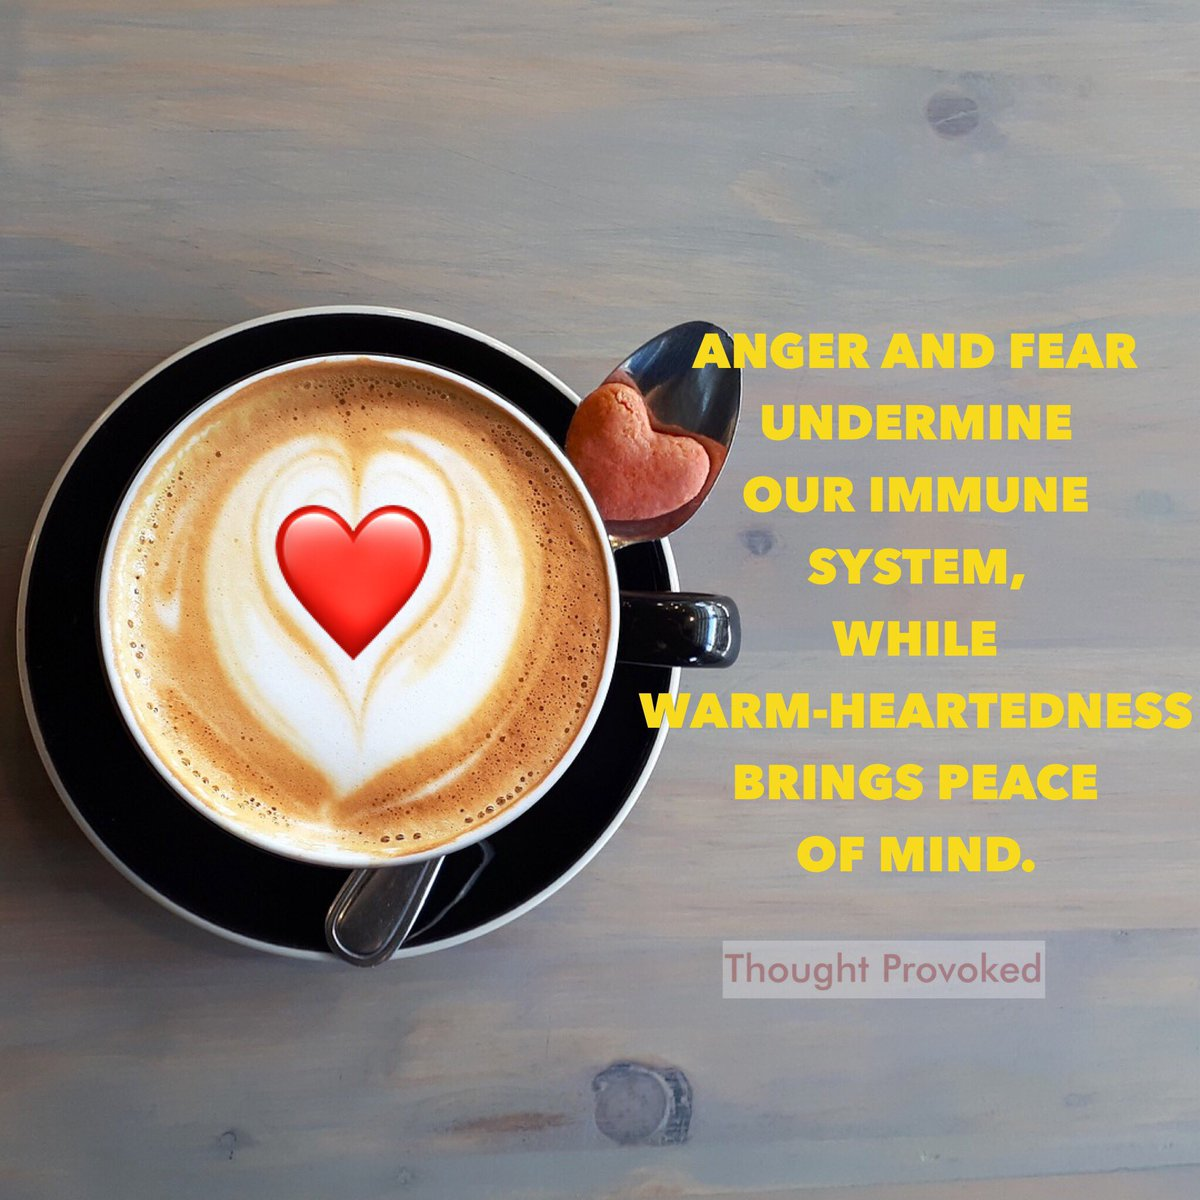 """Warm-heartedness brings peace of mind."" @thoughtprovoke4  @DrJDrooghaag @NevilleGaunt @JolaBurnett @treasadovander @AudreyDesisto @SDGS4GOOD @AmandaRay02 @letgolifeflows @DeborahKozich @LovemakersF @DonnaFins @Hame1DM2020 @AngelHealingArt @helensmomma #quotes #quote #FF #follow"